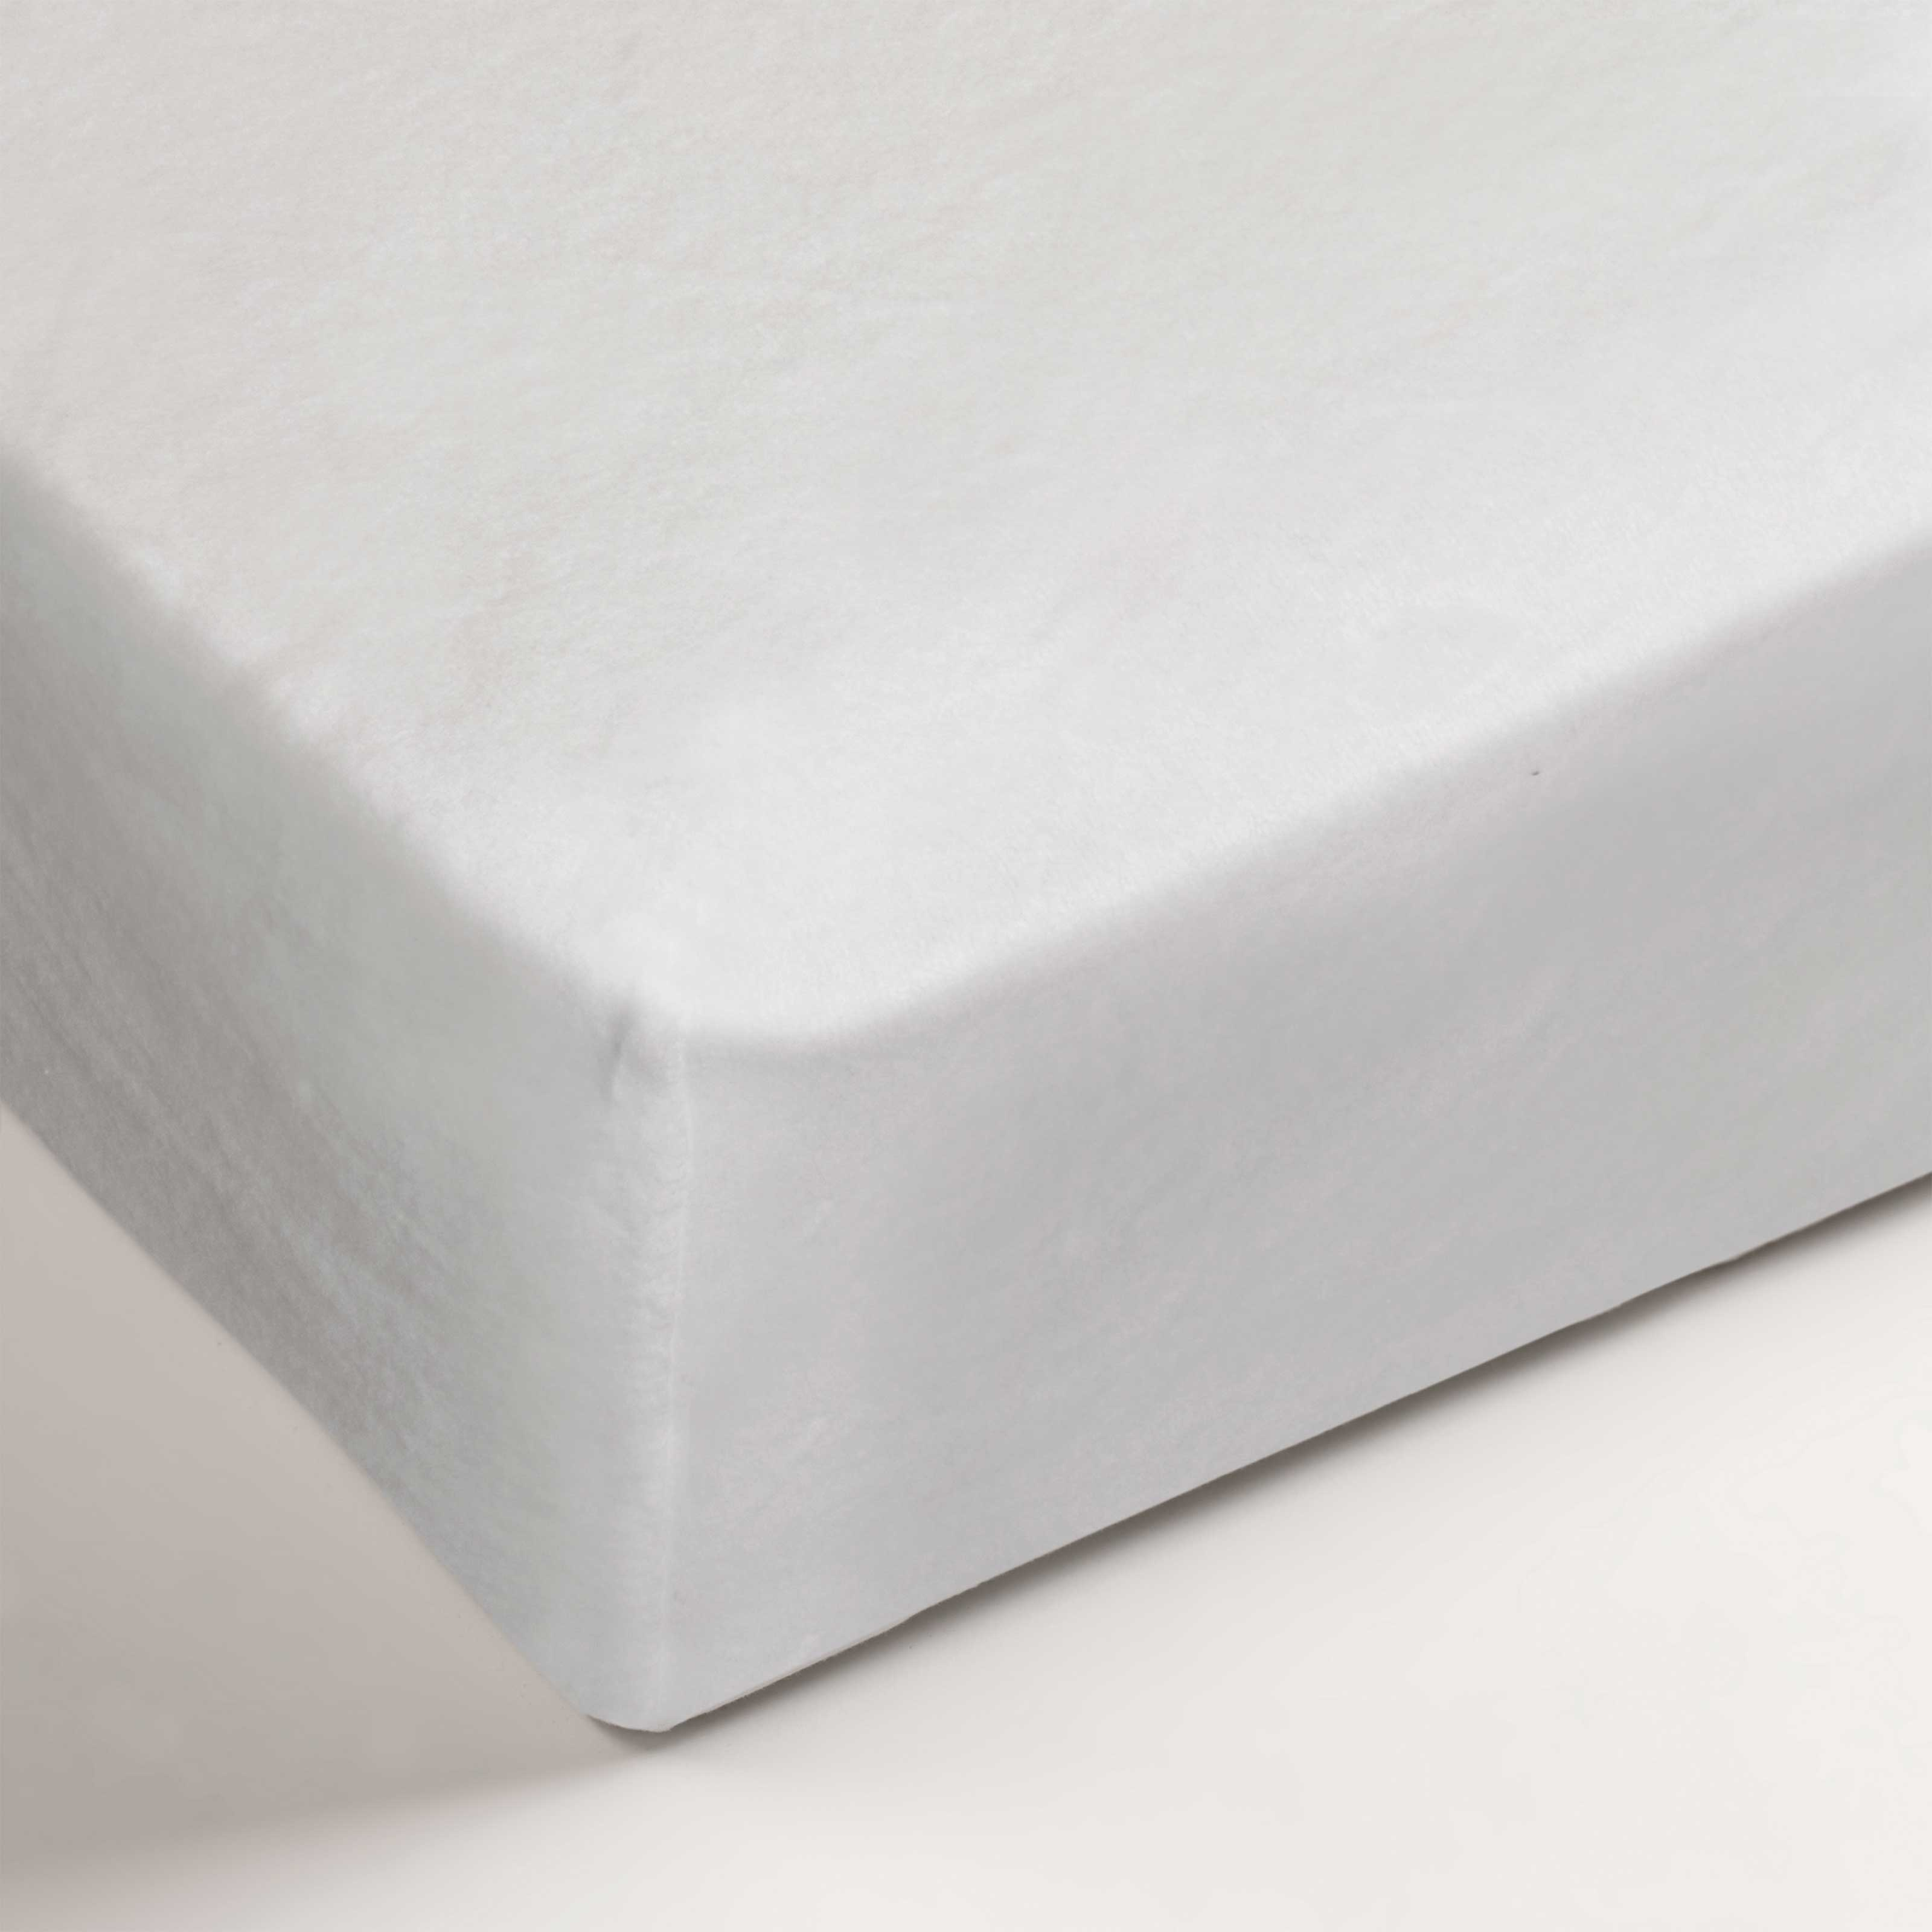 BH molton faconlagen 120x200/220x28 hvid thumbnail